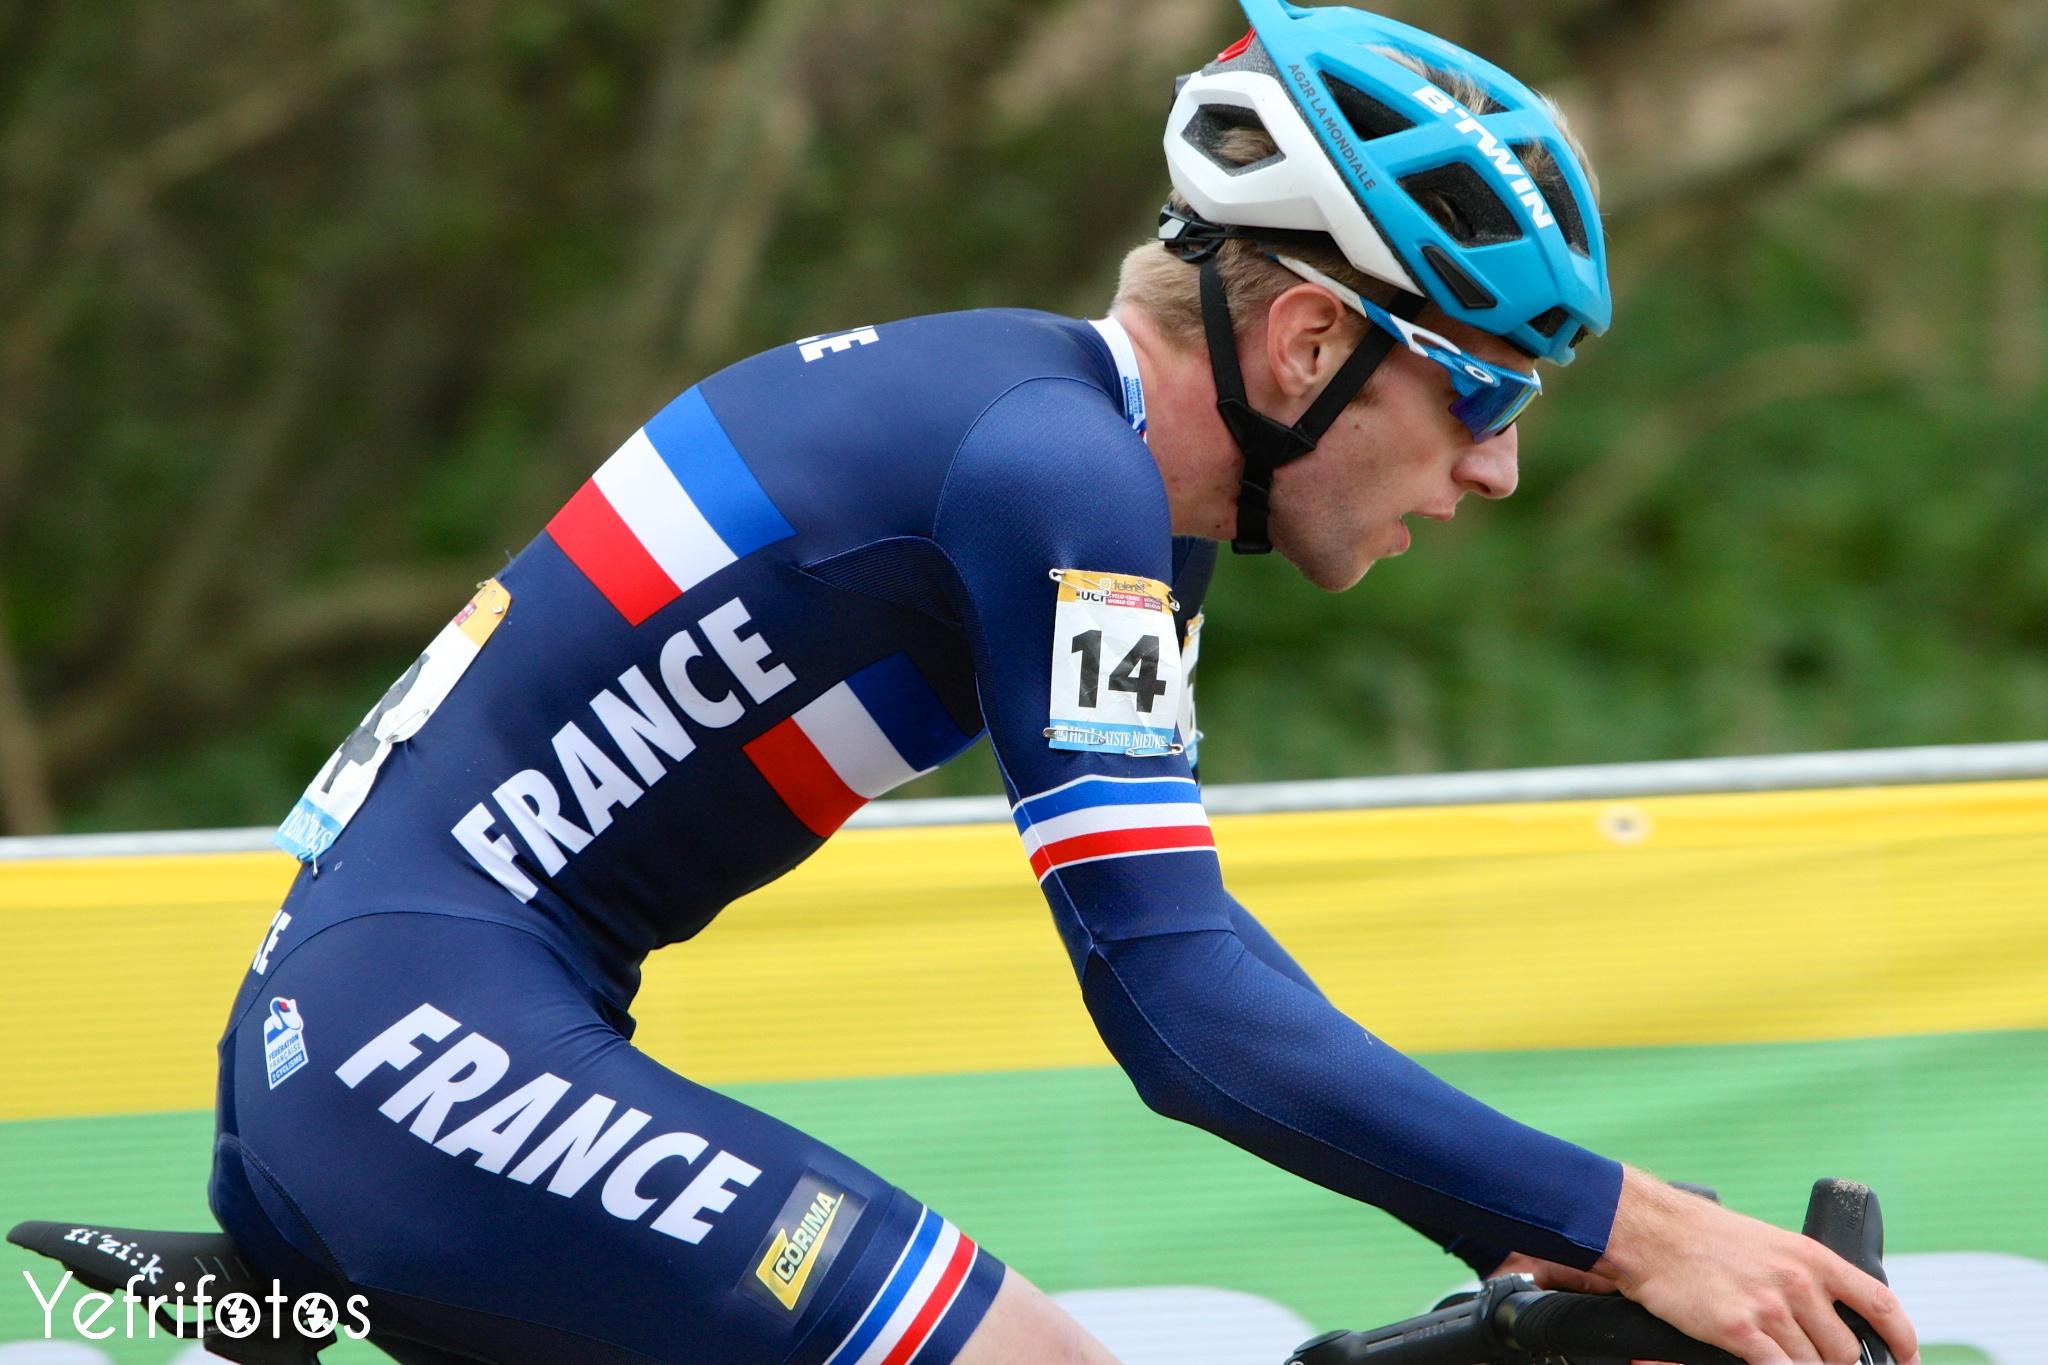 Koksijde -UCI Cyclocross World Cup - Benjamin Rivet